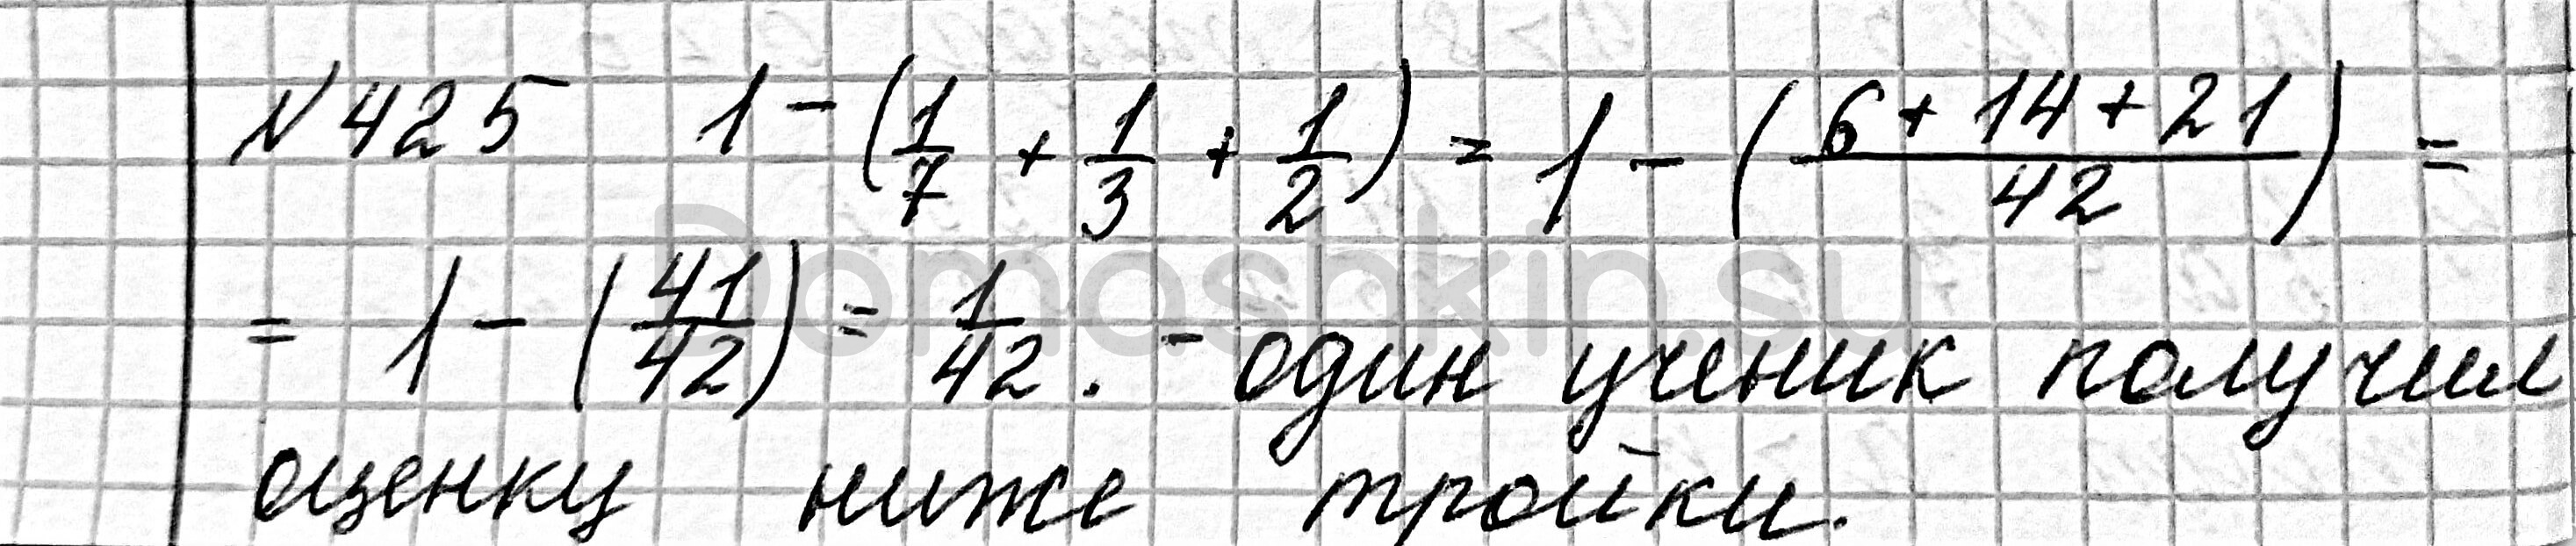 Математика 6 класс учебник Мерзляк номер 425 решение